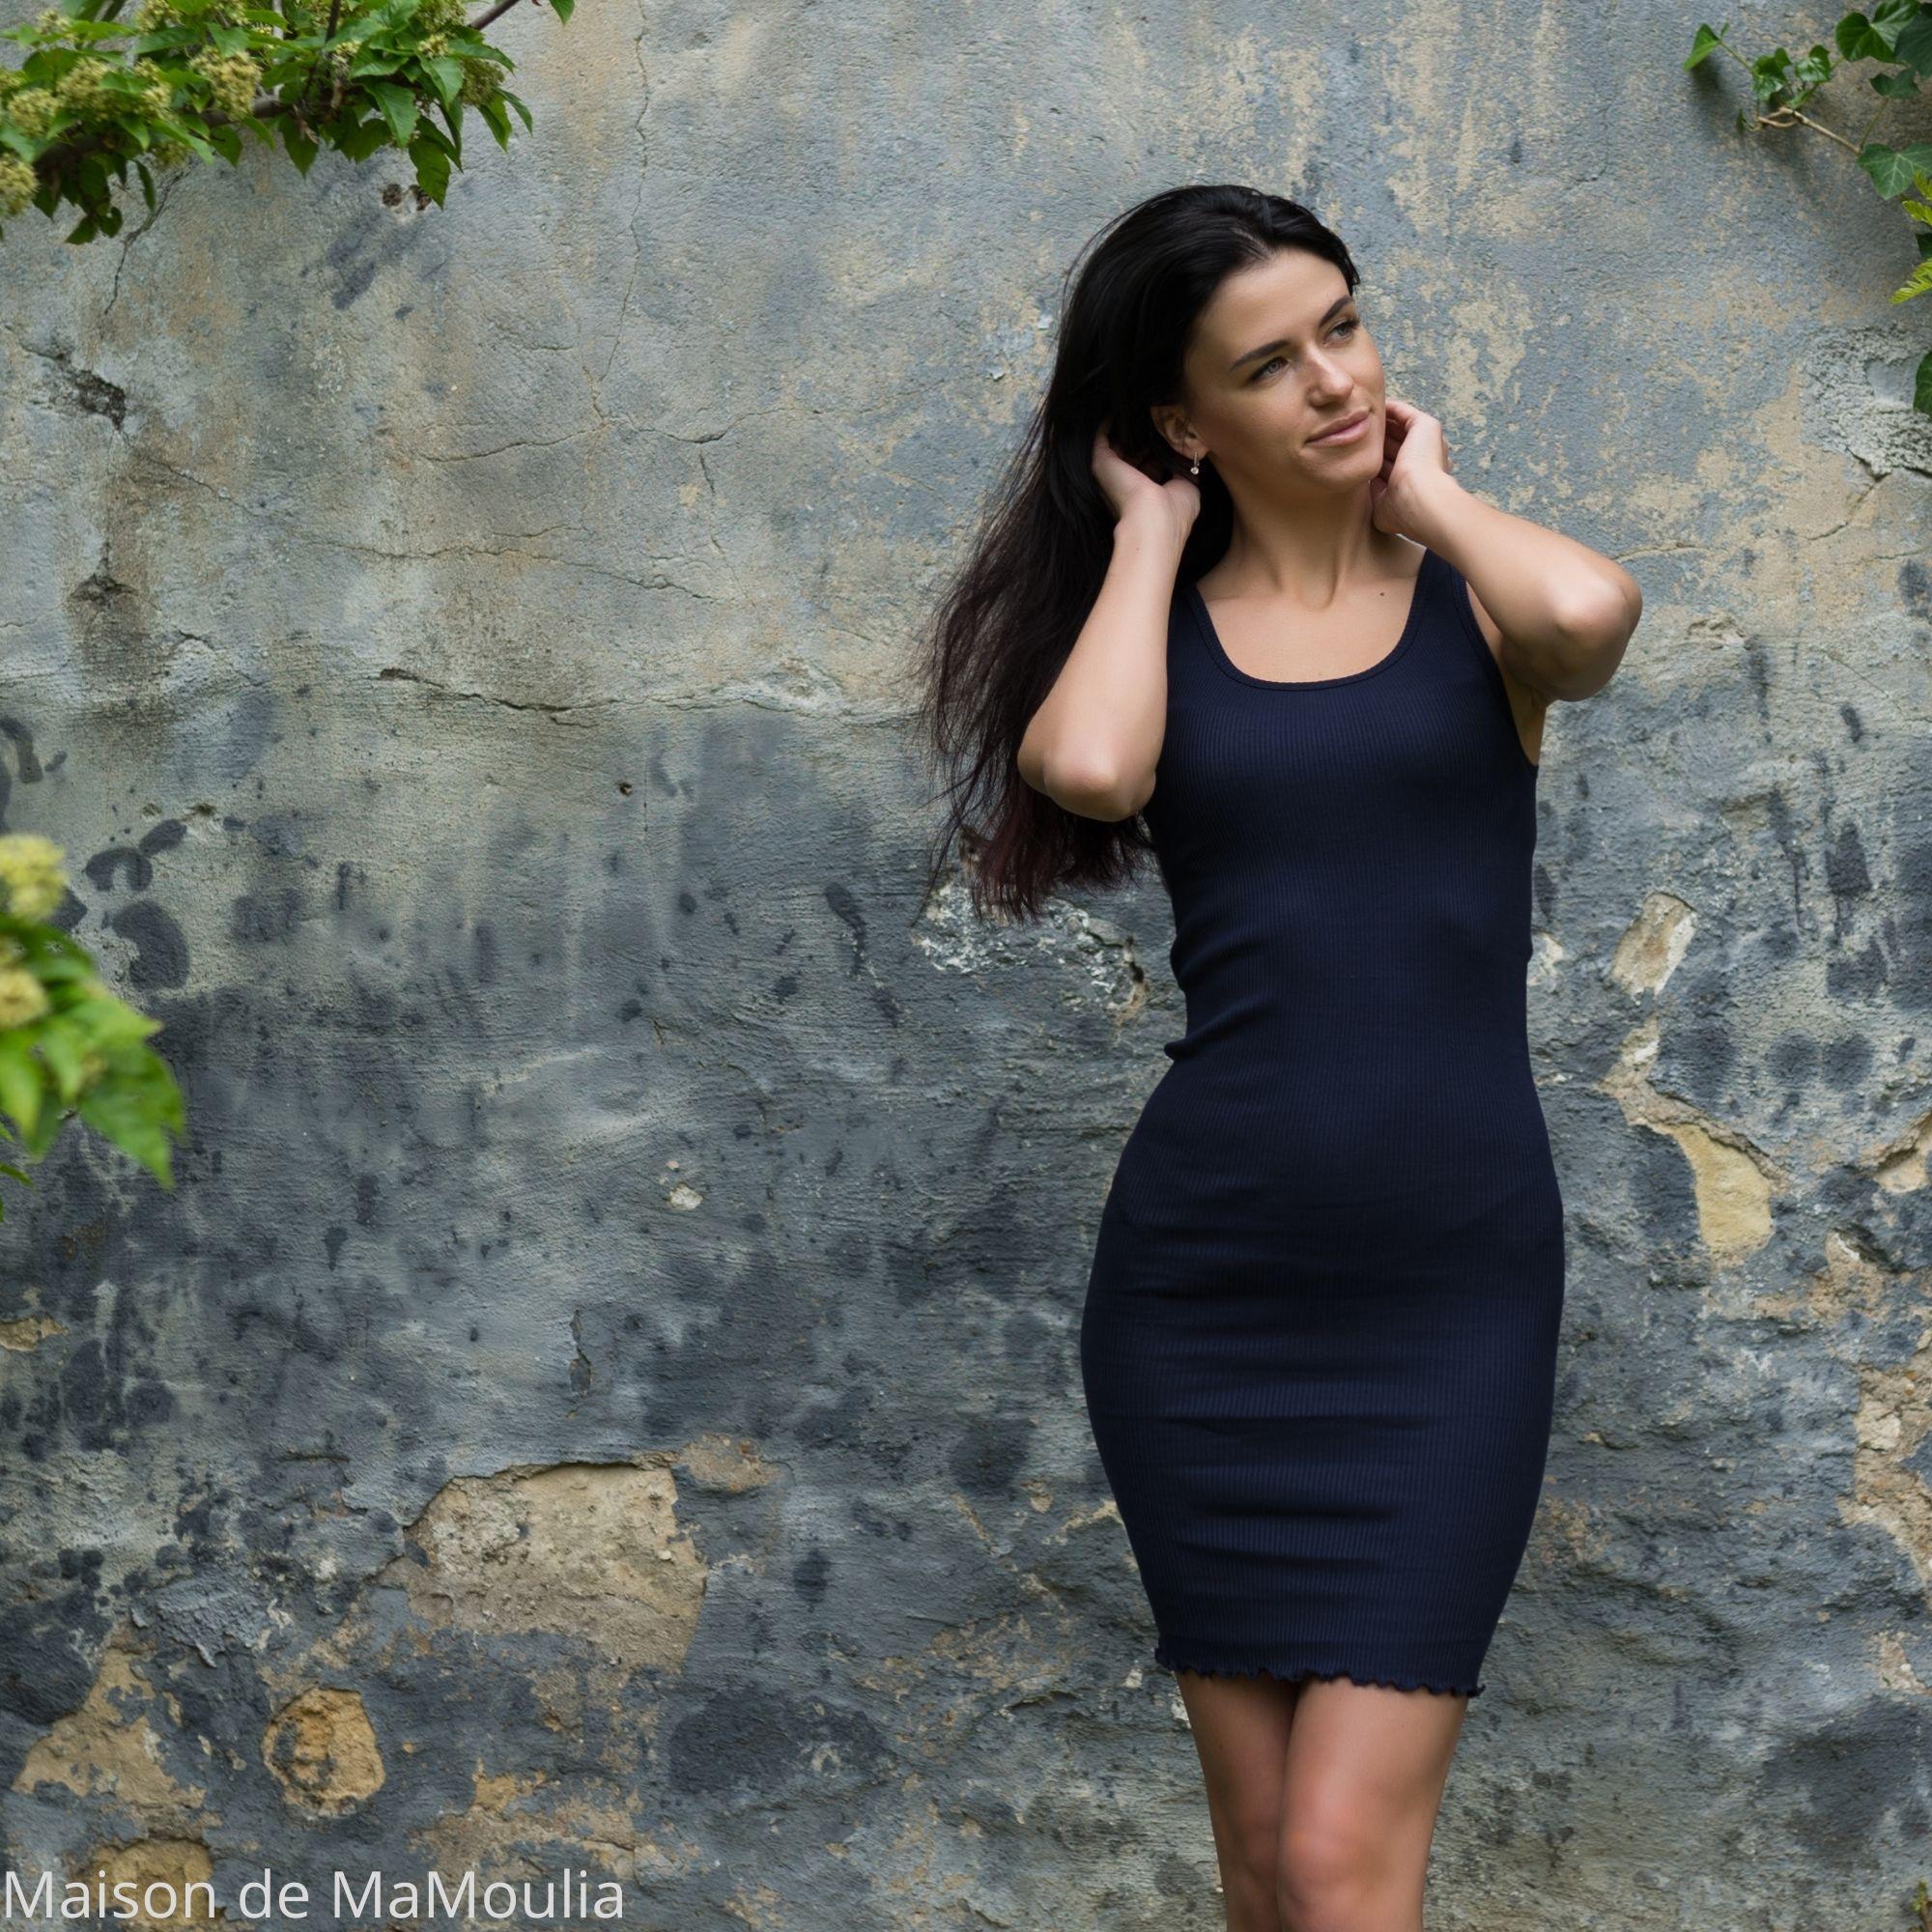 minimalisma-Gry-robe-debardeur-femme-soie-coton-maison-de-mamoulia-bleu-marine-sans-manches